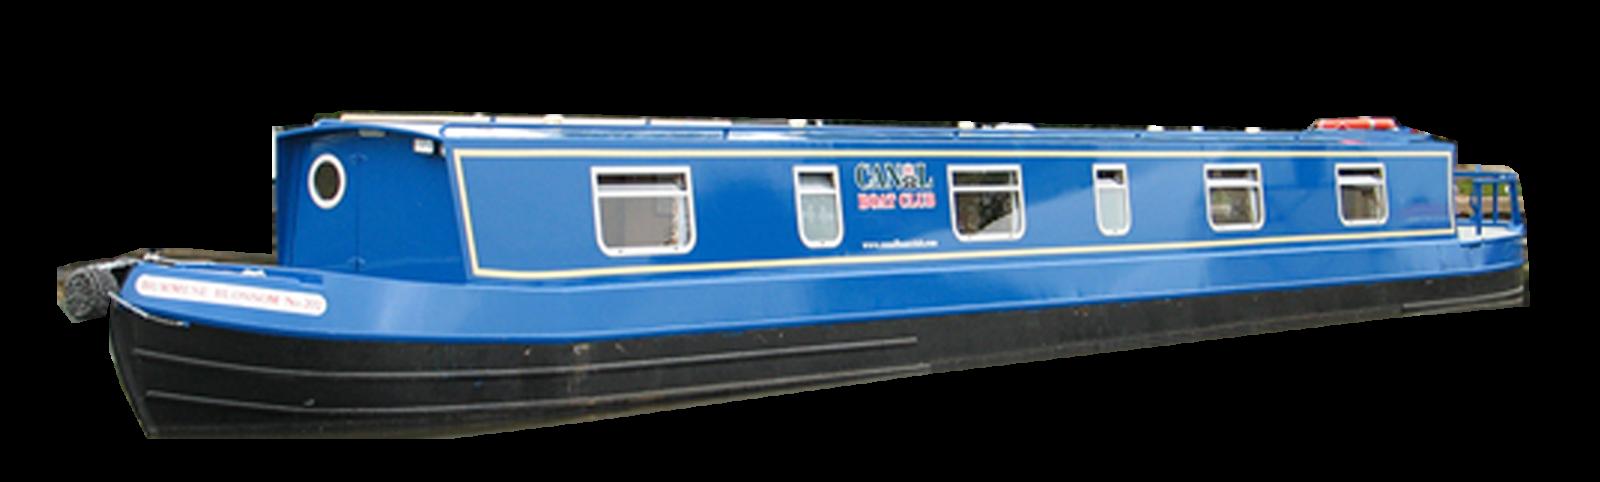 canalboat